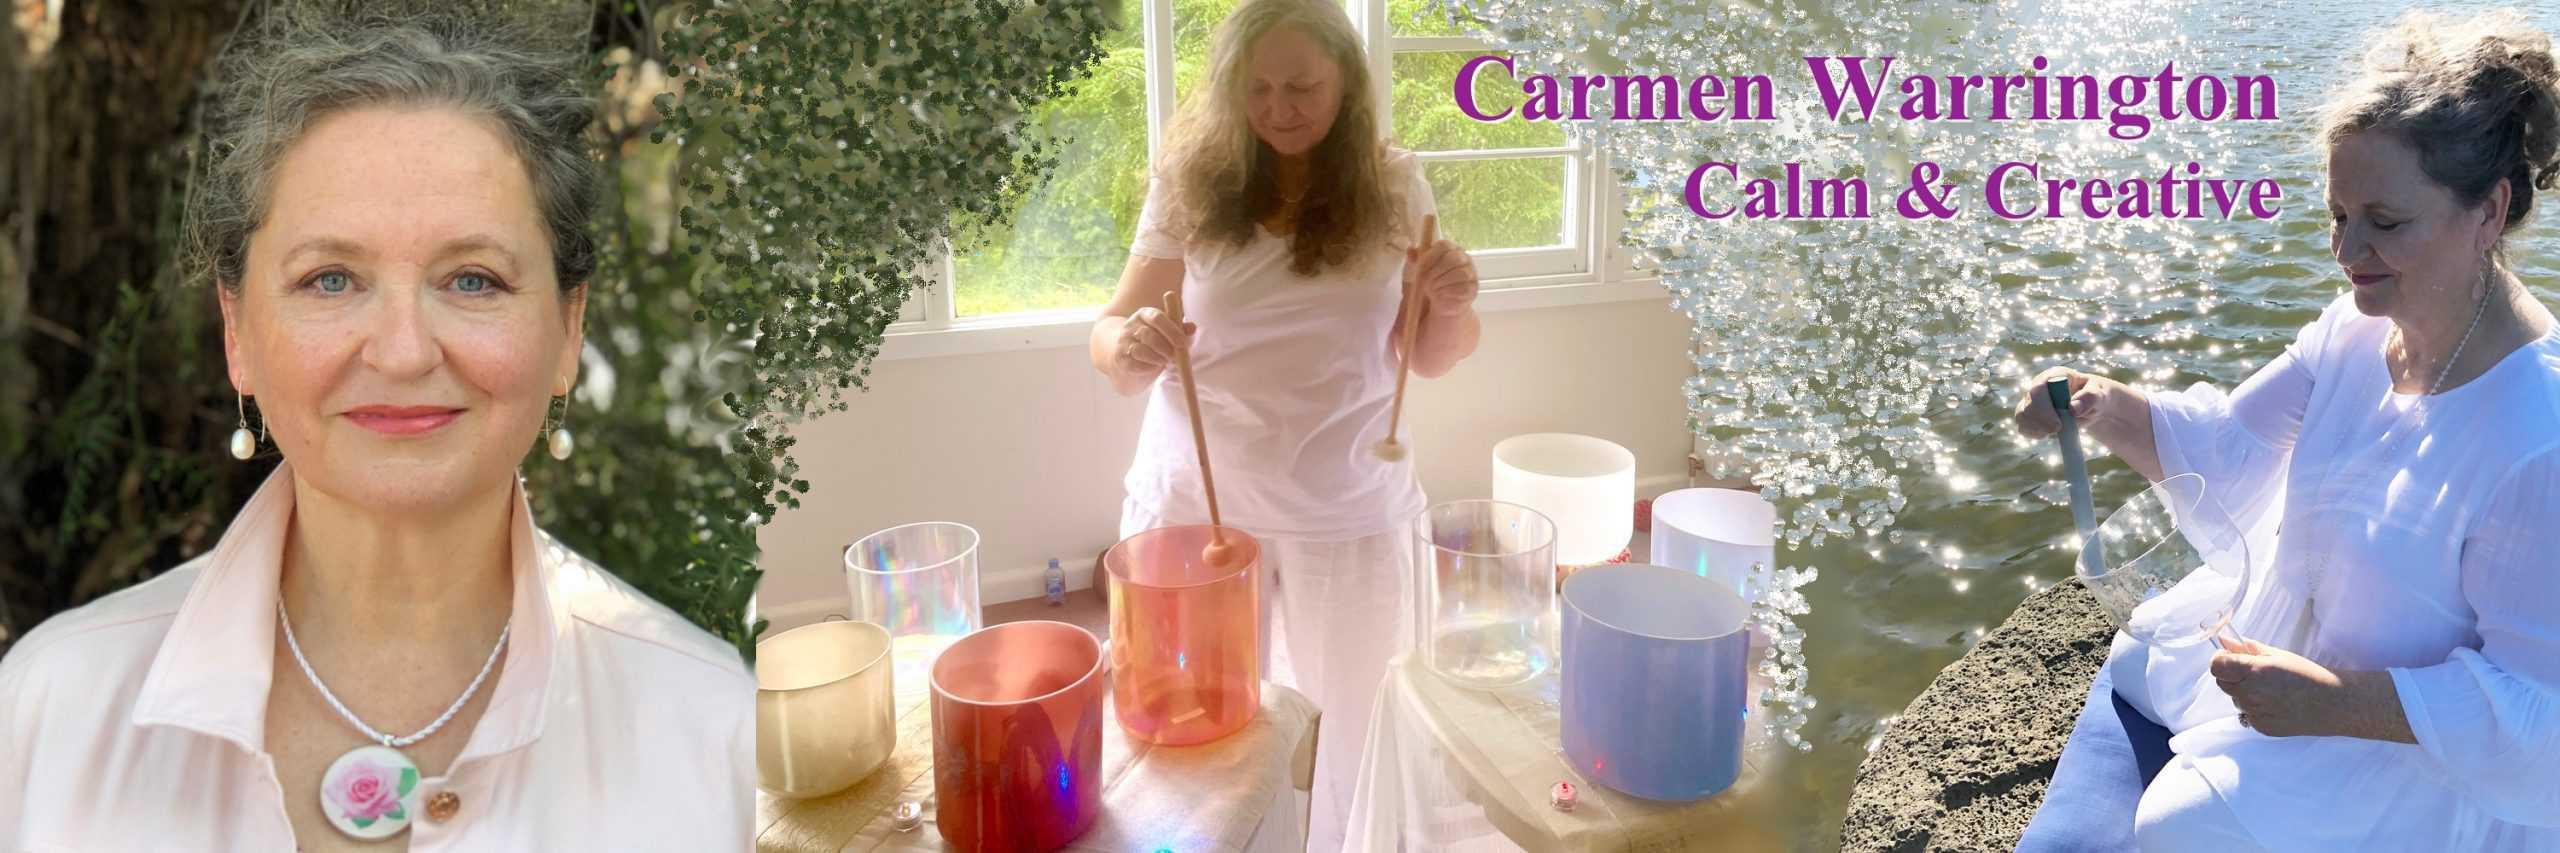 Carmen Warrington